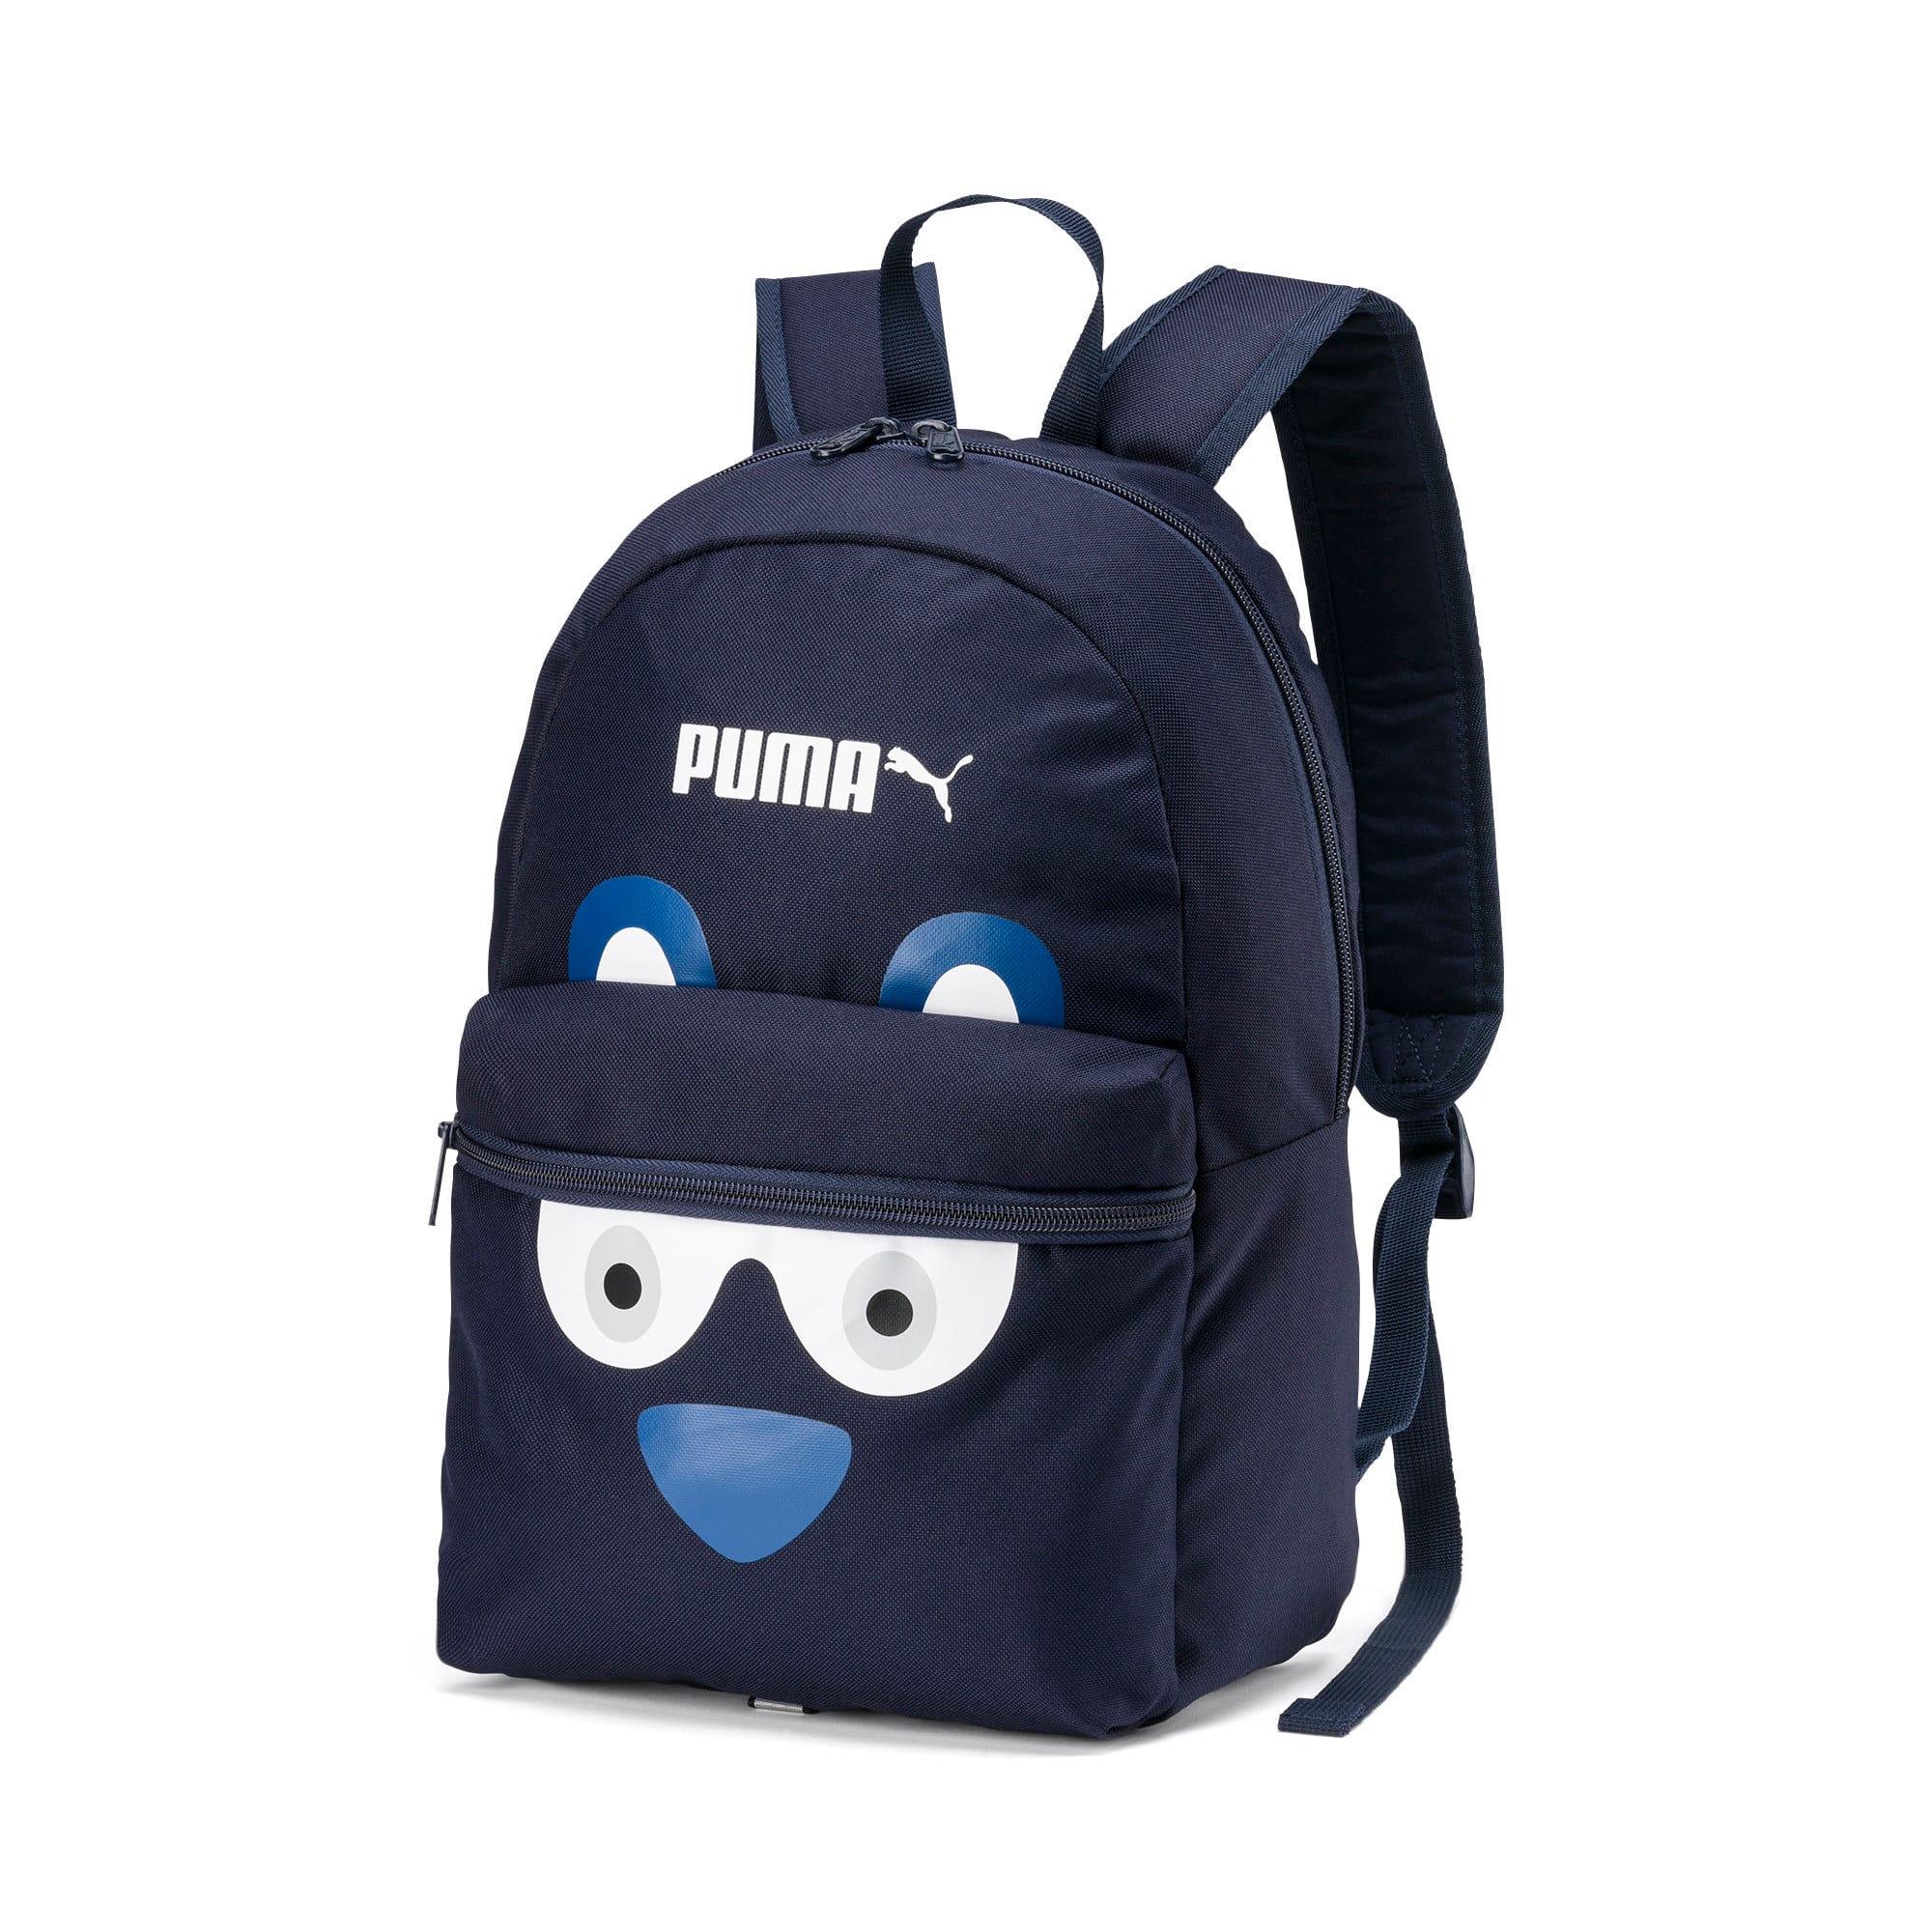 Thumbnail 1 of PUMA Monster Backpack, Peacoat, medium-IND